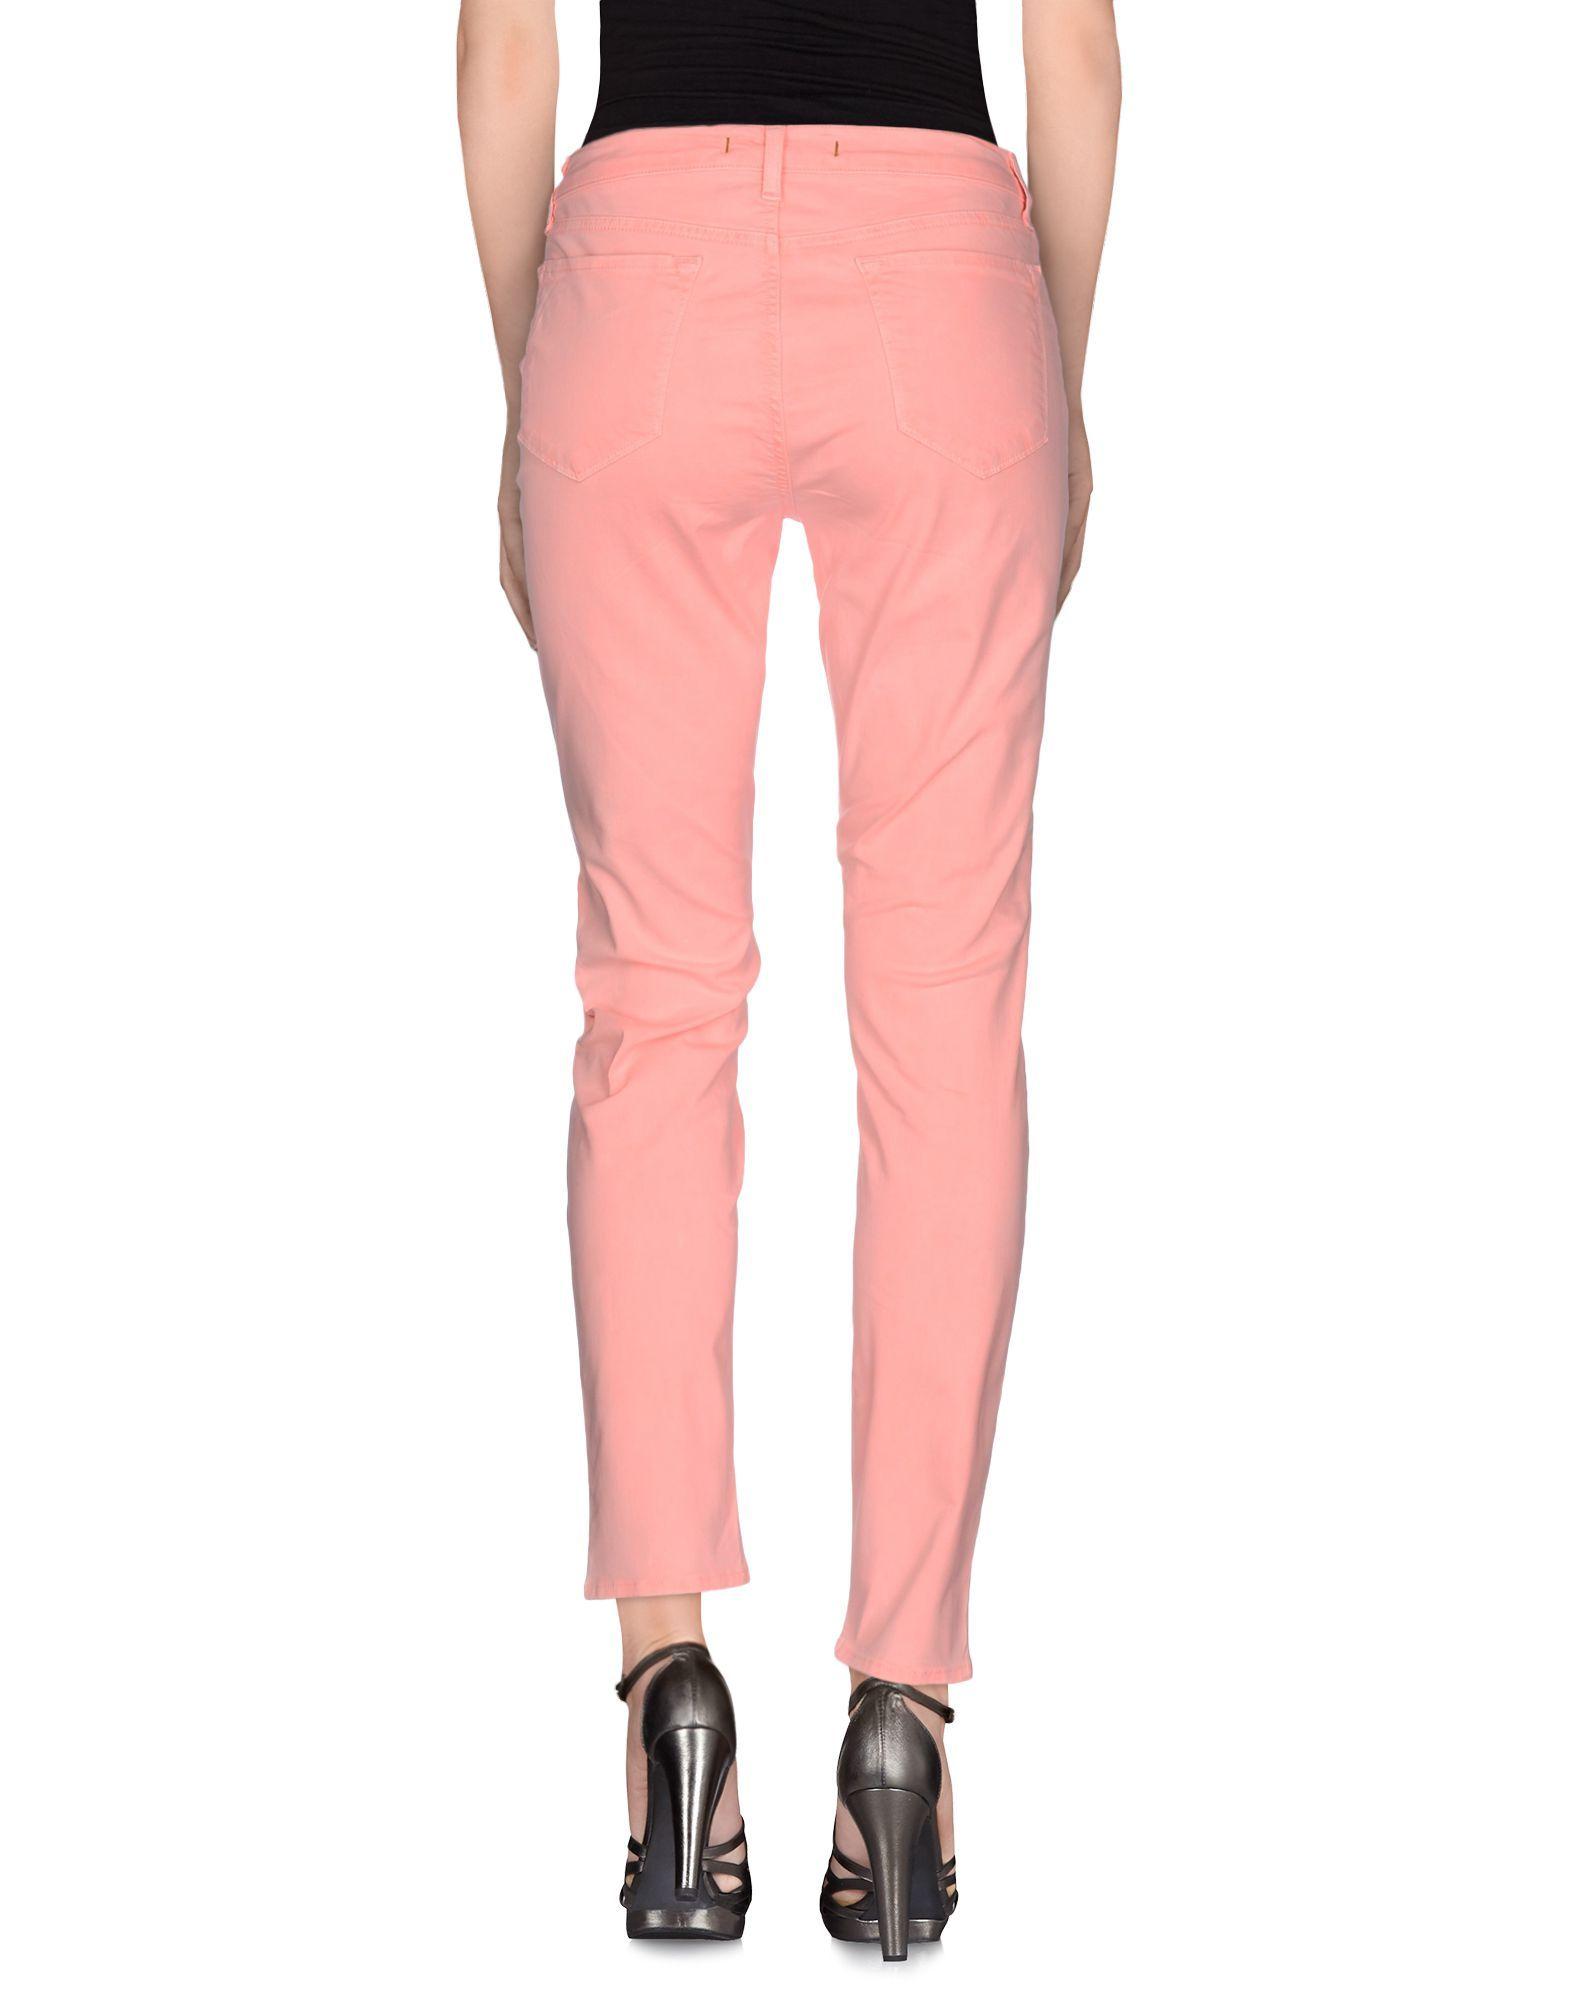 J Brand Salmon Pink Cotton Slim Fit Jeans